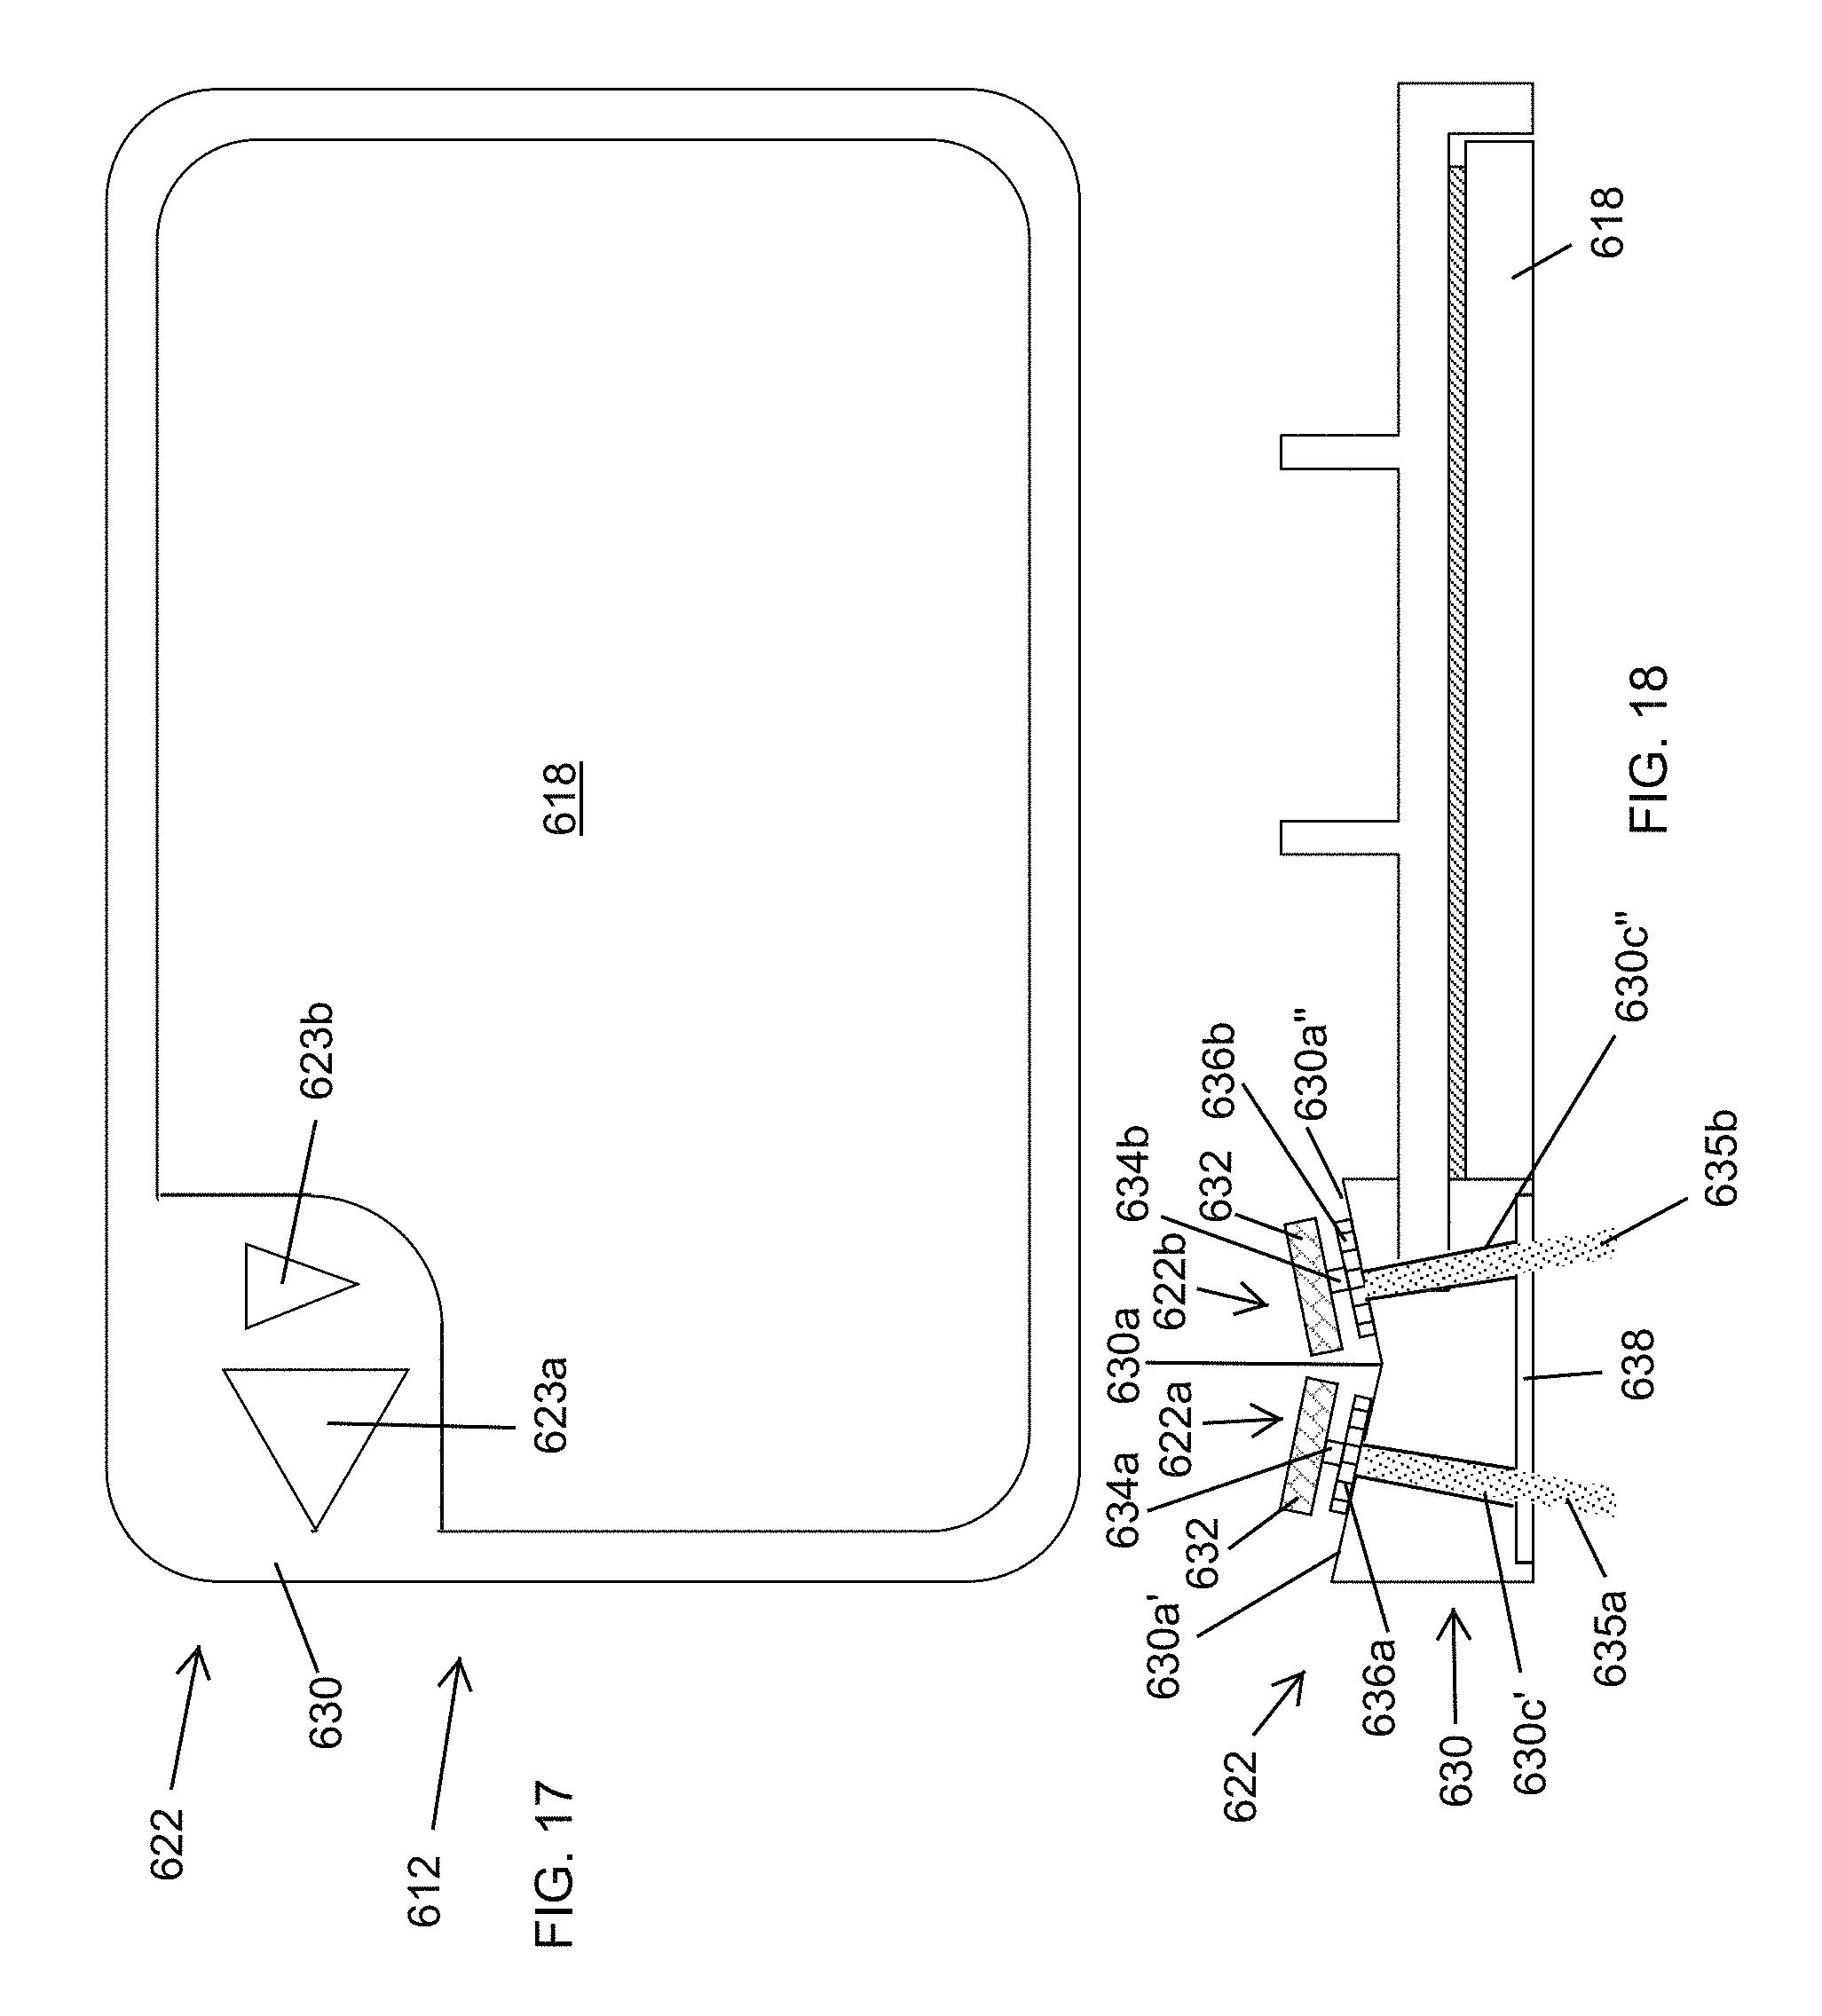 Patent Us 9758102 B1 Headlight Range Level Sensor Connector Pigtail Plug Wiring 0406 Vw 0 Petitions